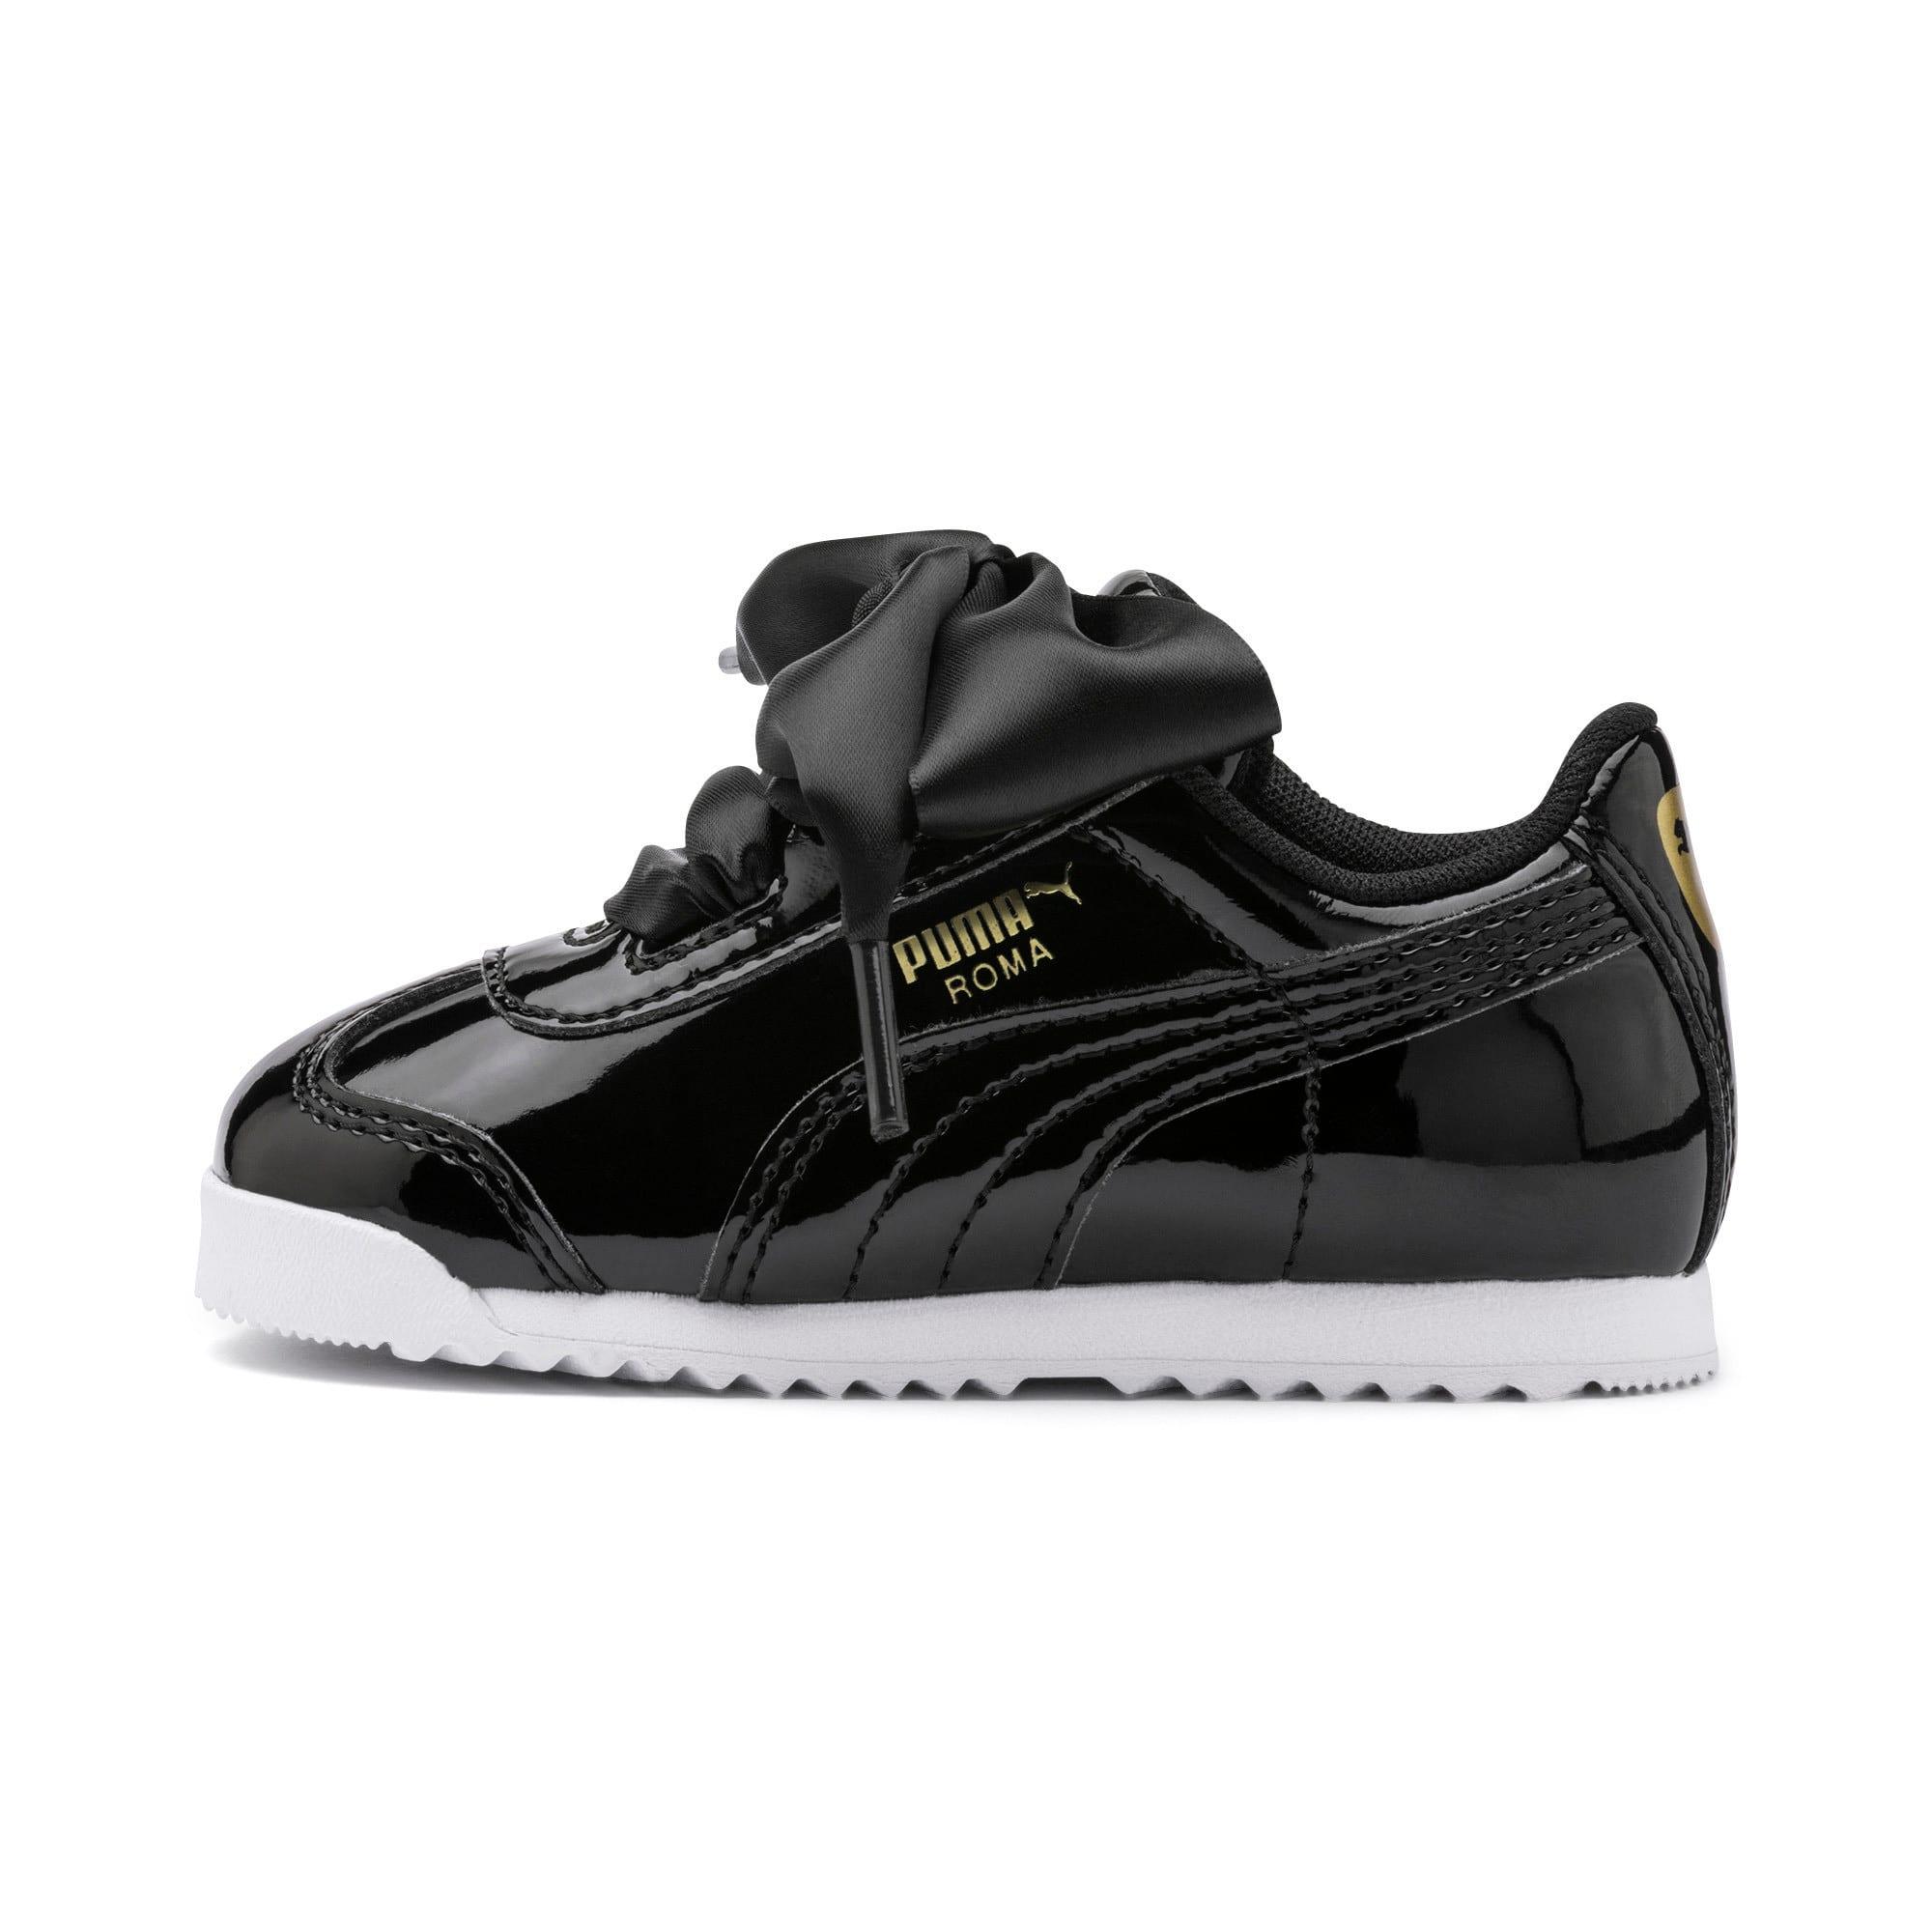 Thumbnail 1 of Roma Heart Patent Toddler Shoes, Puma Black, medium